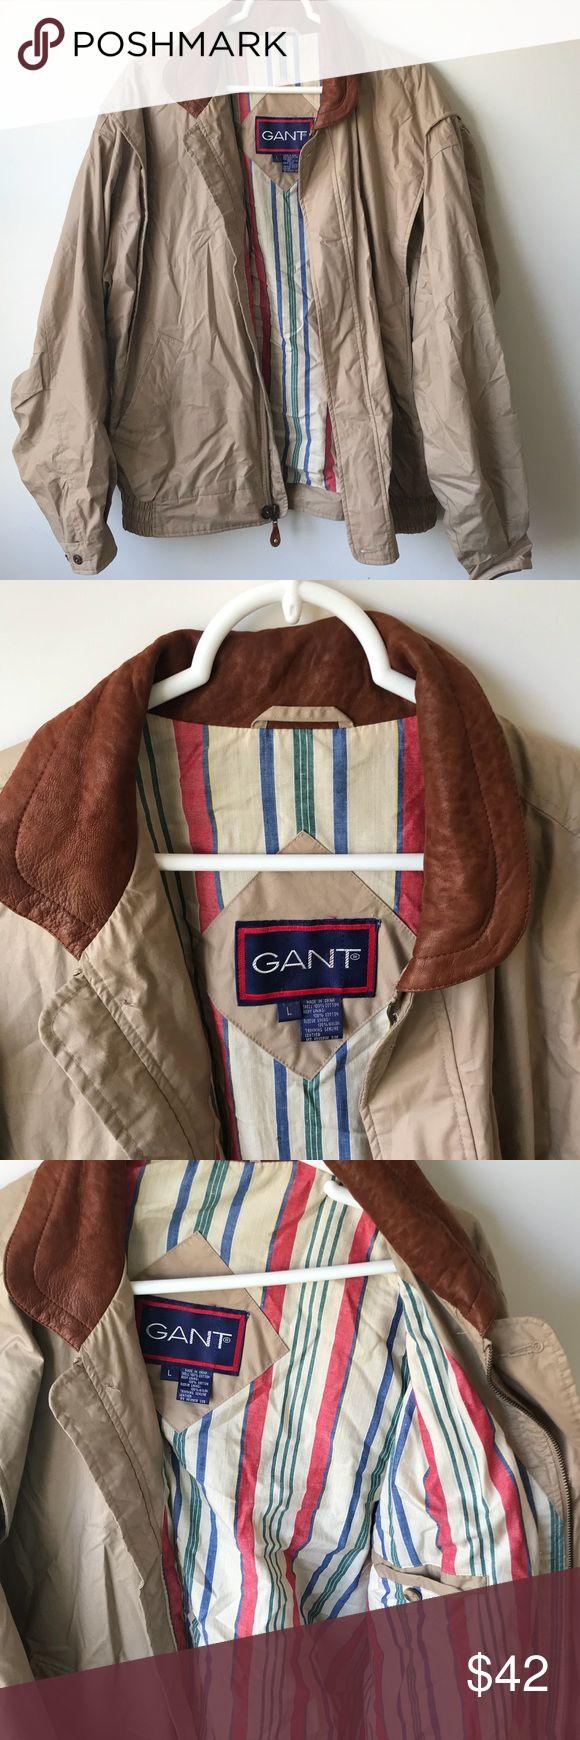 LARGE GANT JACKET perfect Christmas present!! buy asap((: Gant Jackets & Coats Lightweight & Shirt Jackets